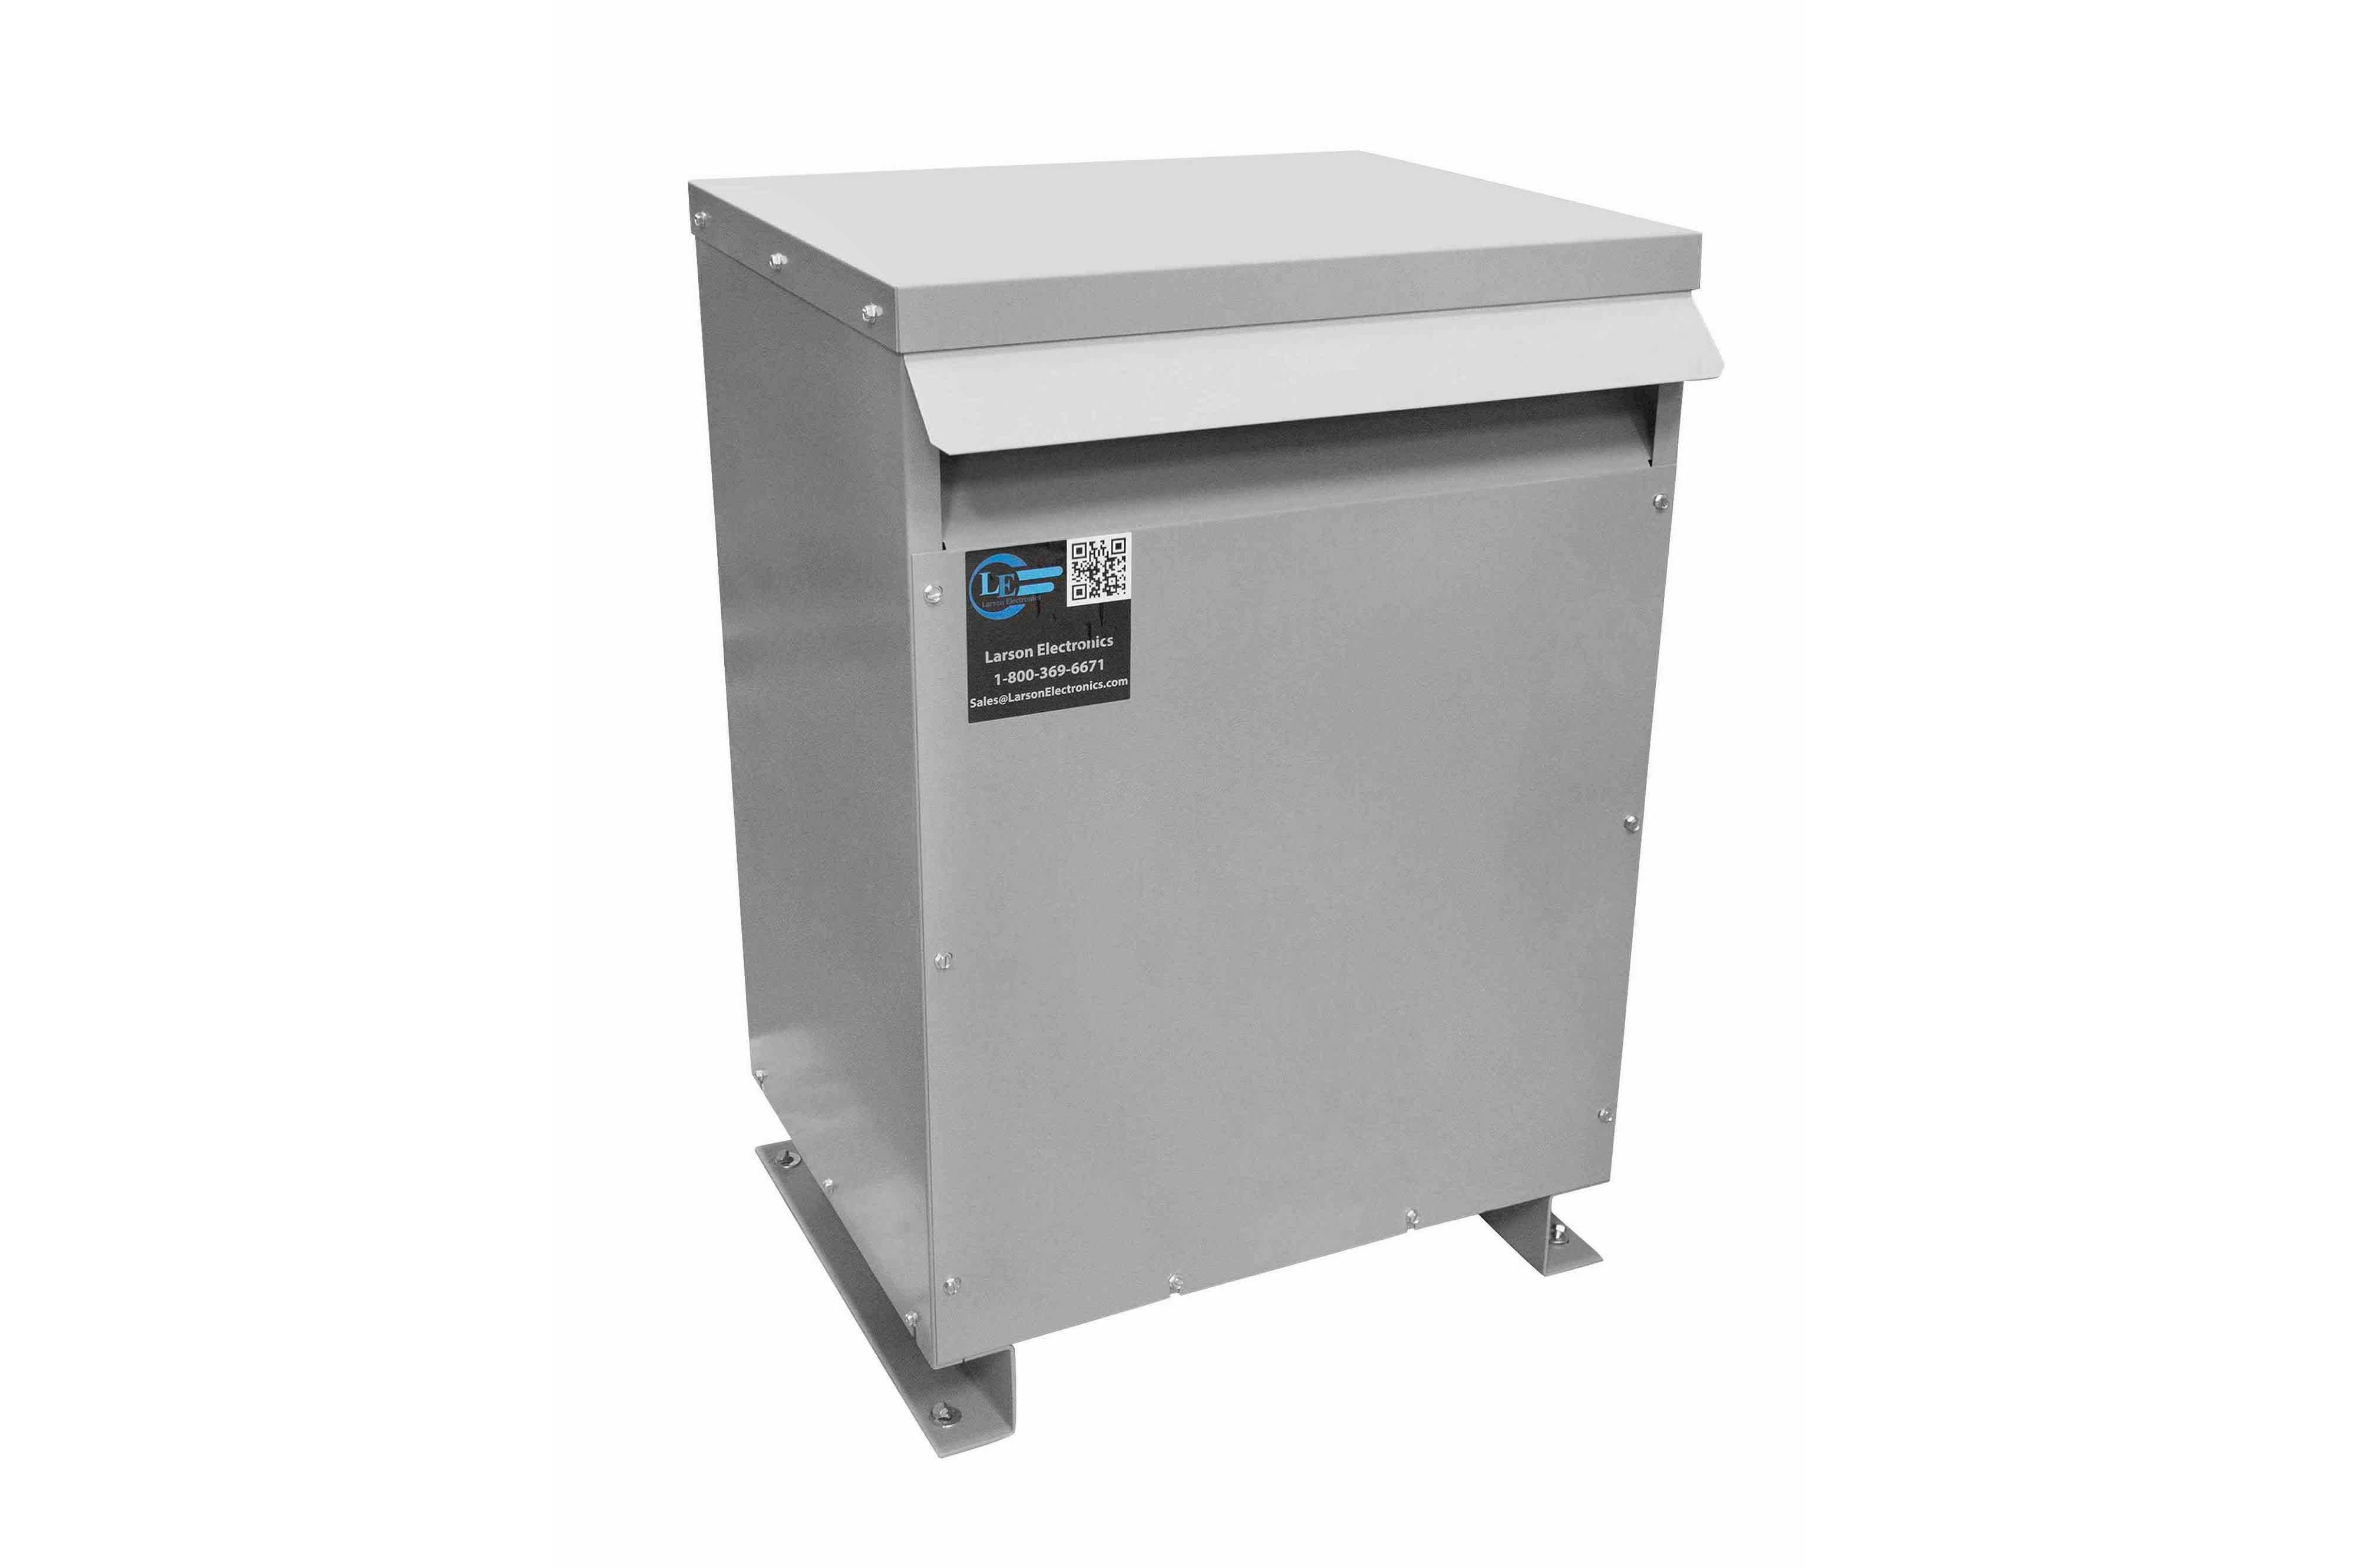 900 kVA 3PH Isolation Transformer, 400V Wye Primary, 600V Delta Secondary, N3R, Ventilated, 60 Hz